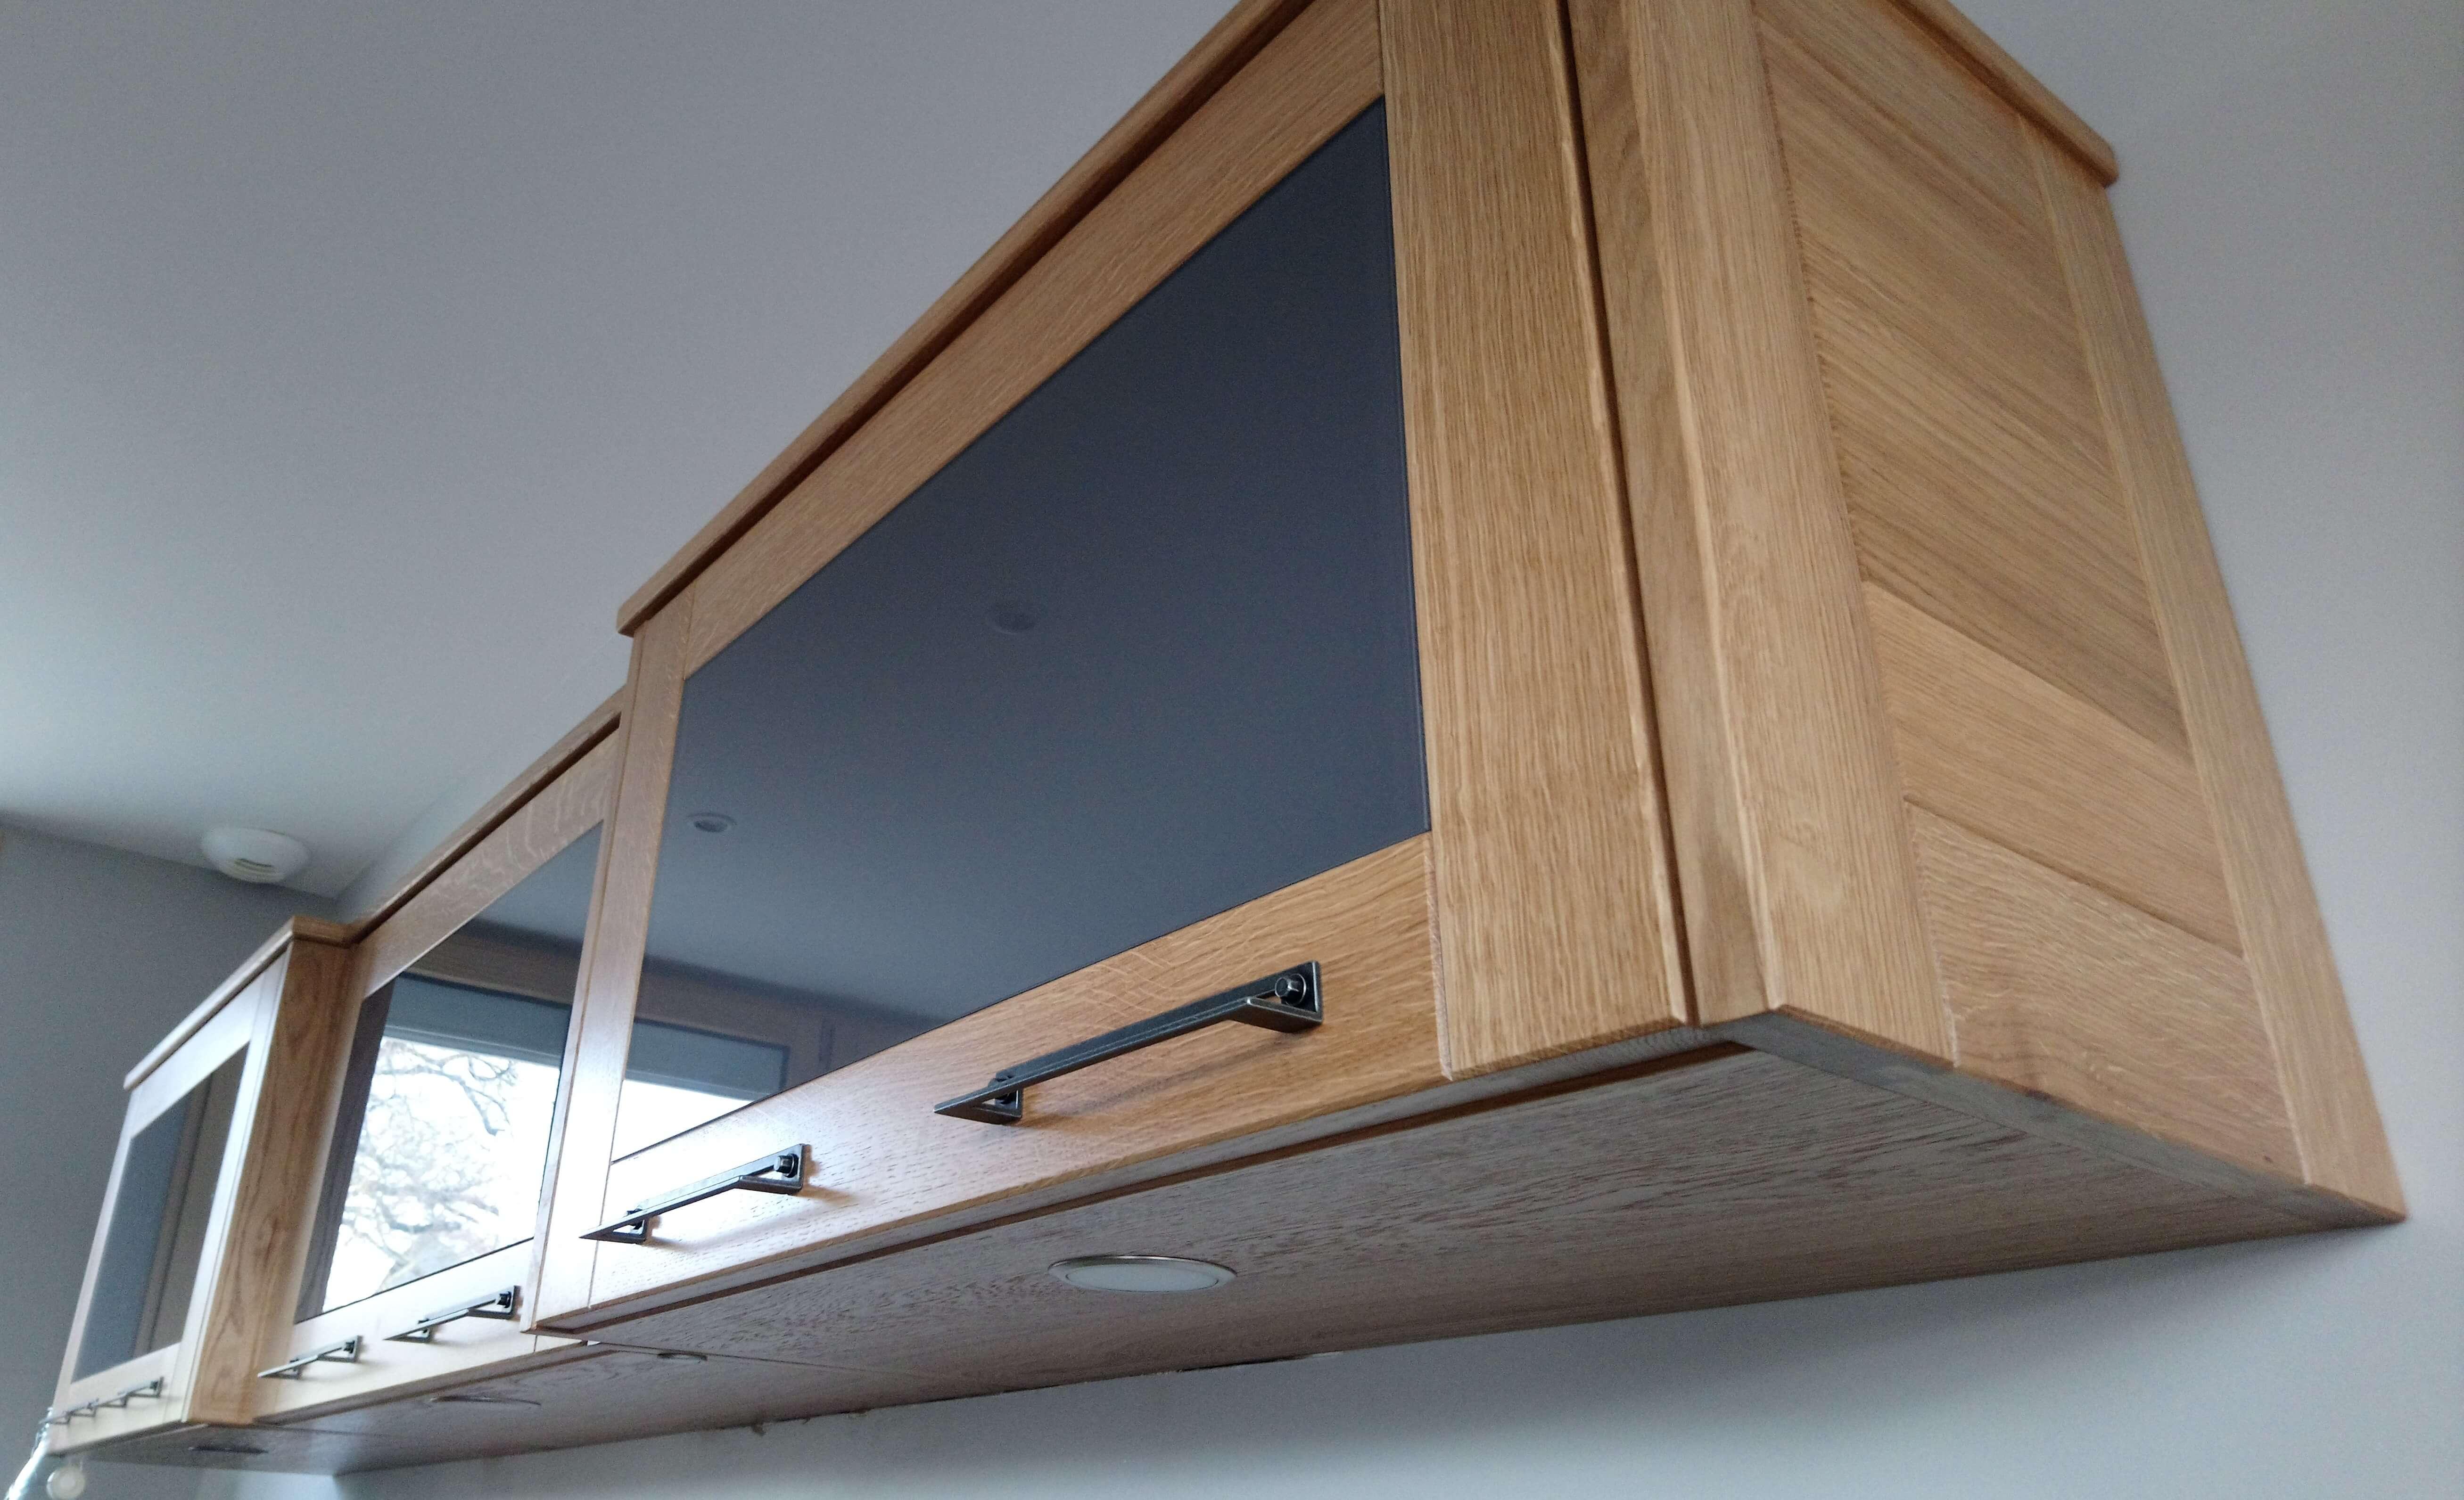 Menuiserie Figard - Fabrication sur mesure - Cuisine - Chêne verre laqué - Vesoul